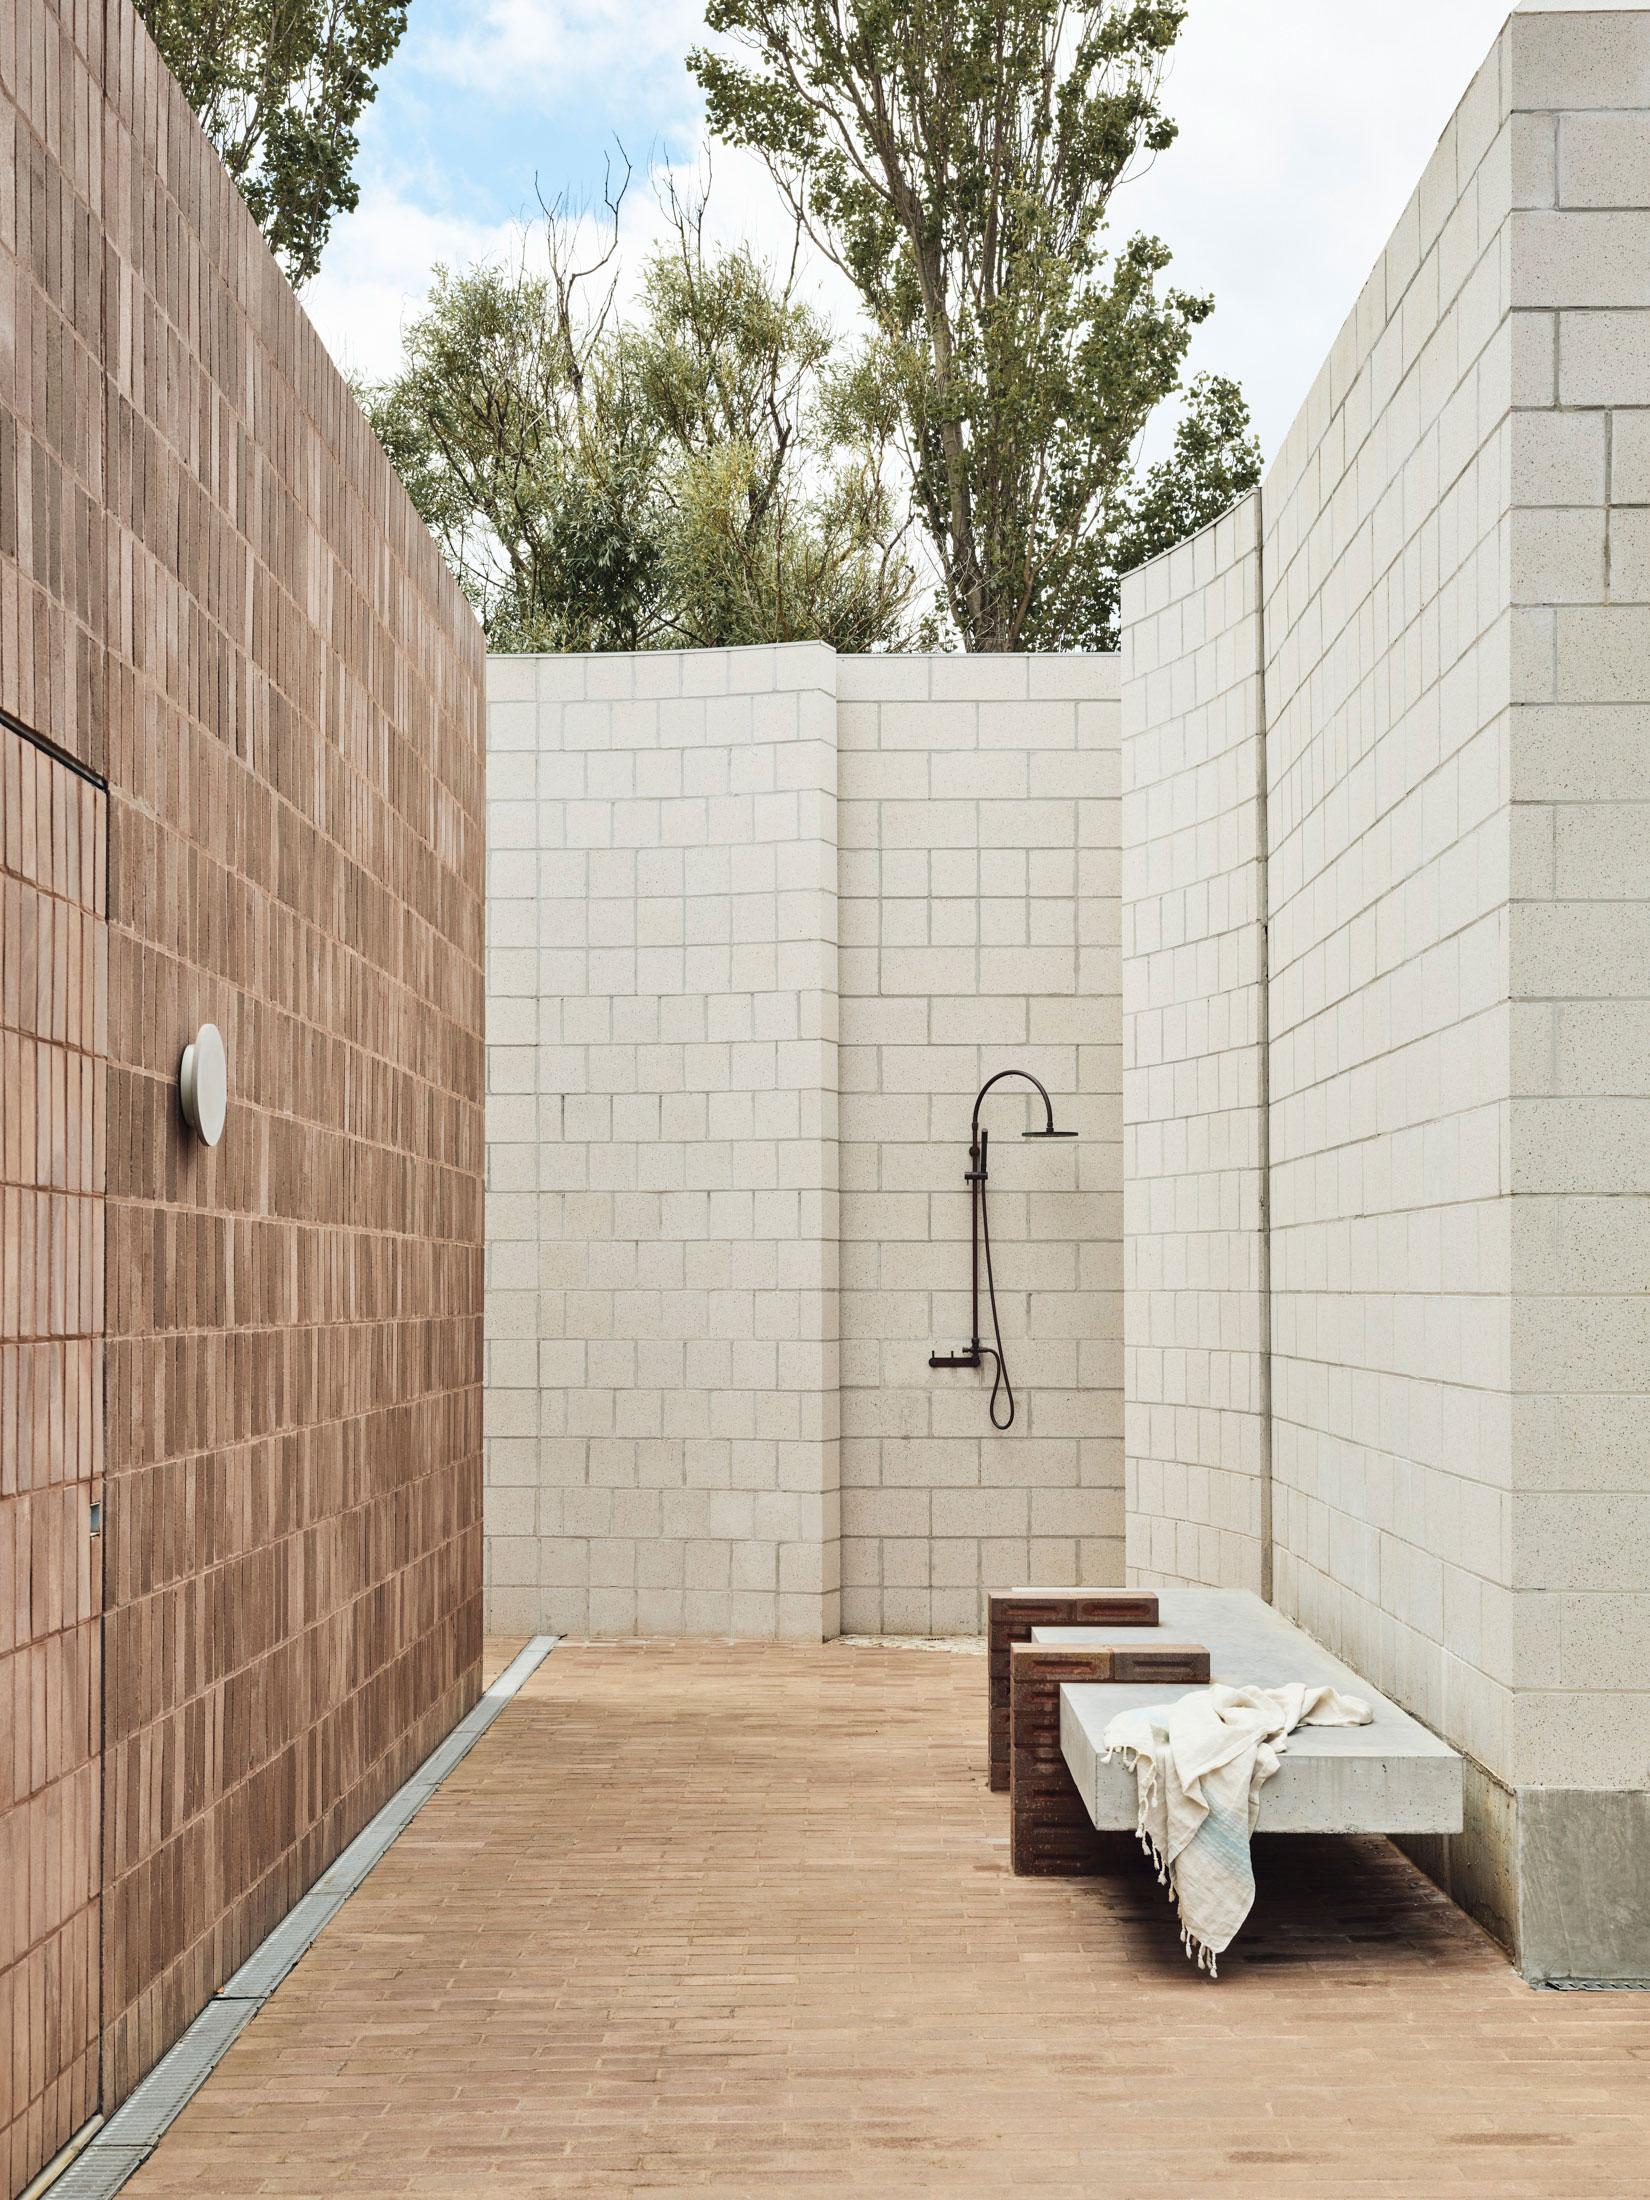 Architects Eat Bellows Beach House Flinders Masonry Architecture Photo Derek Swalwell Yellowtrace 09